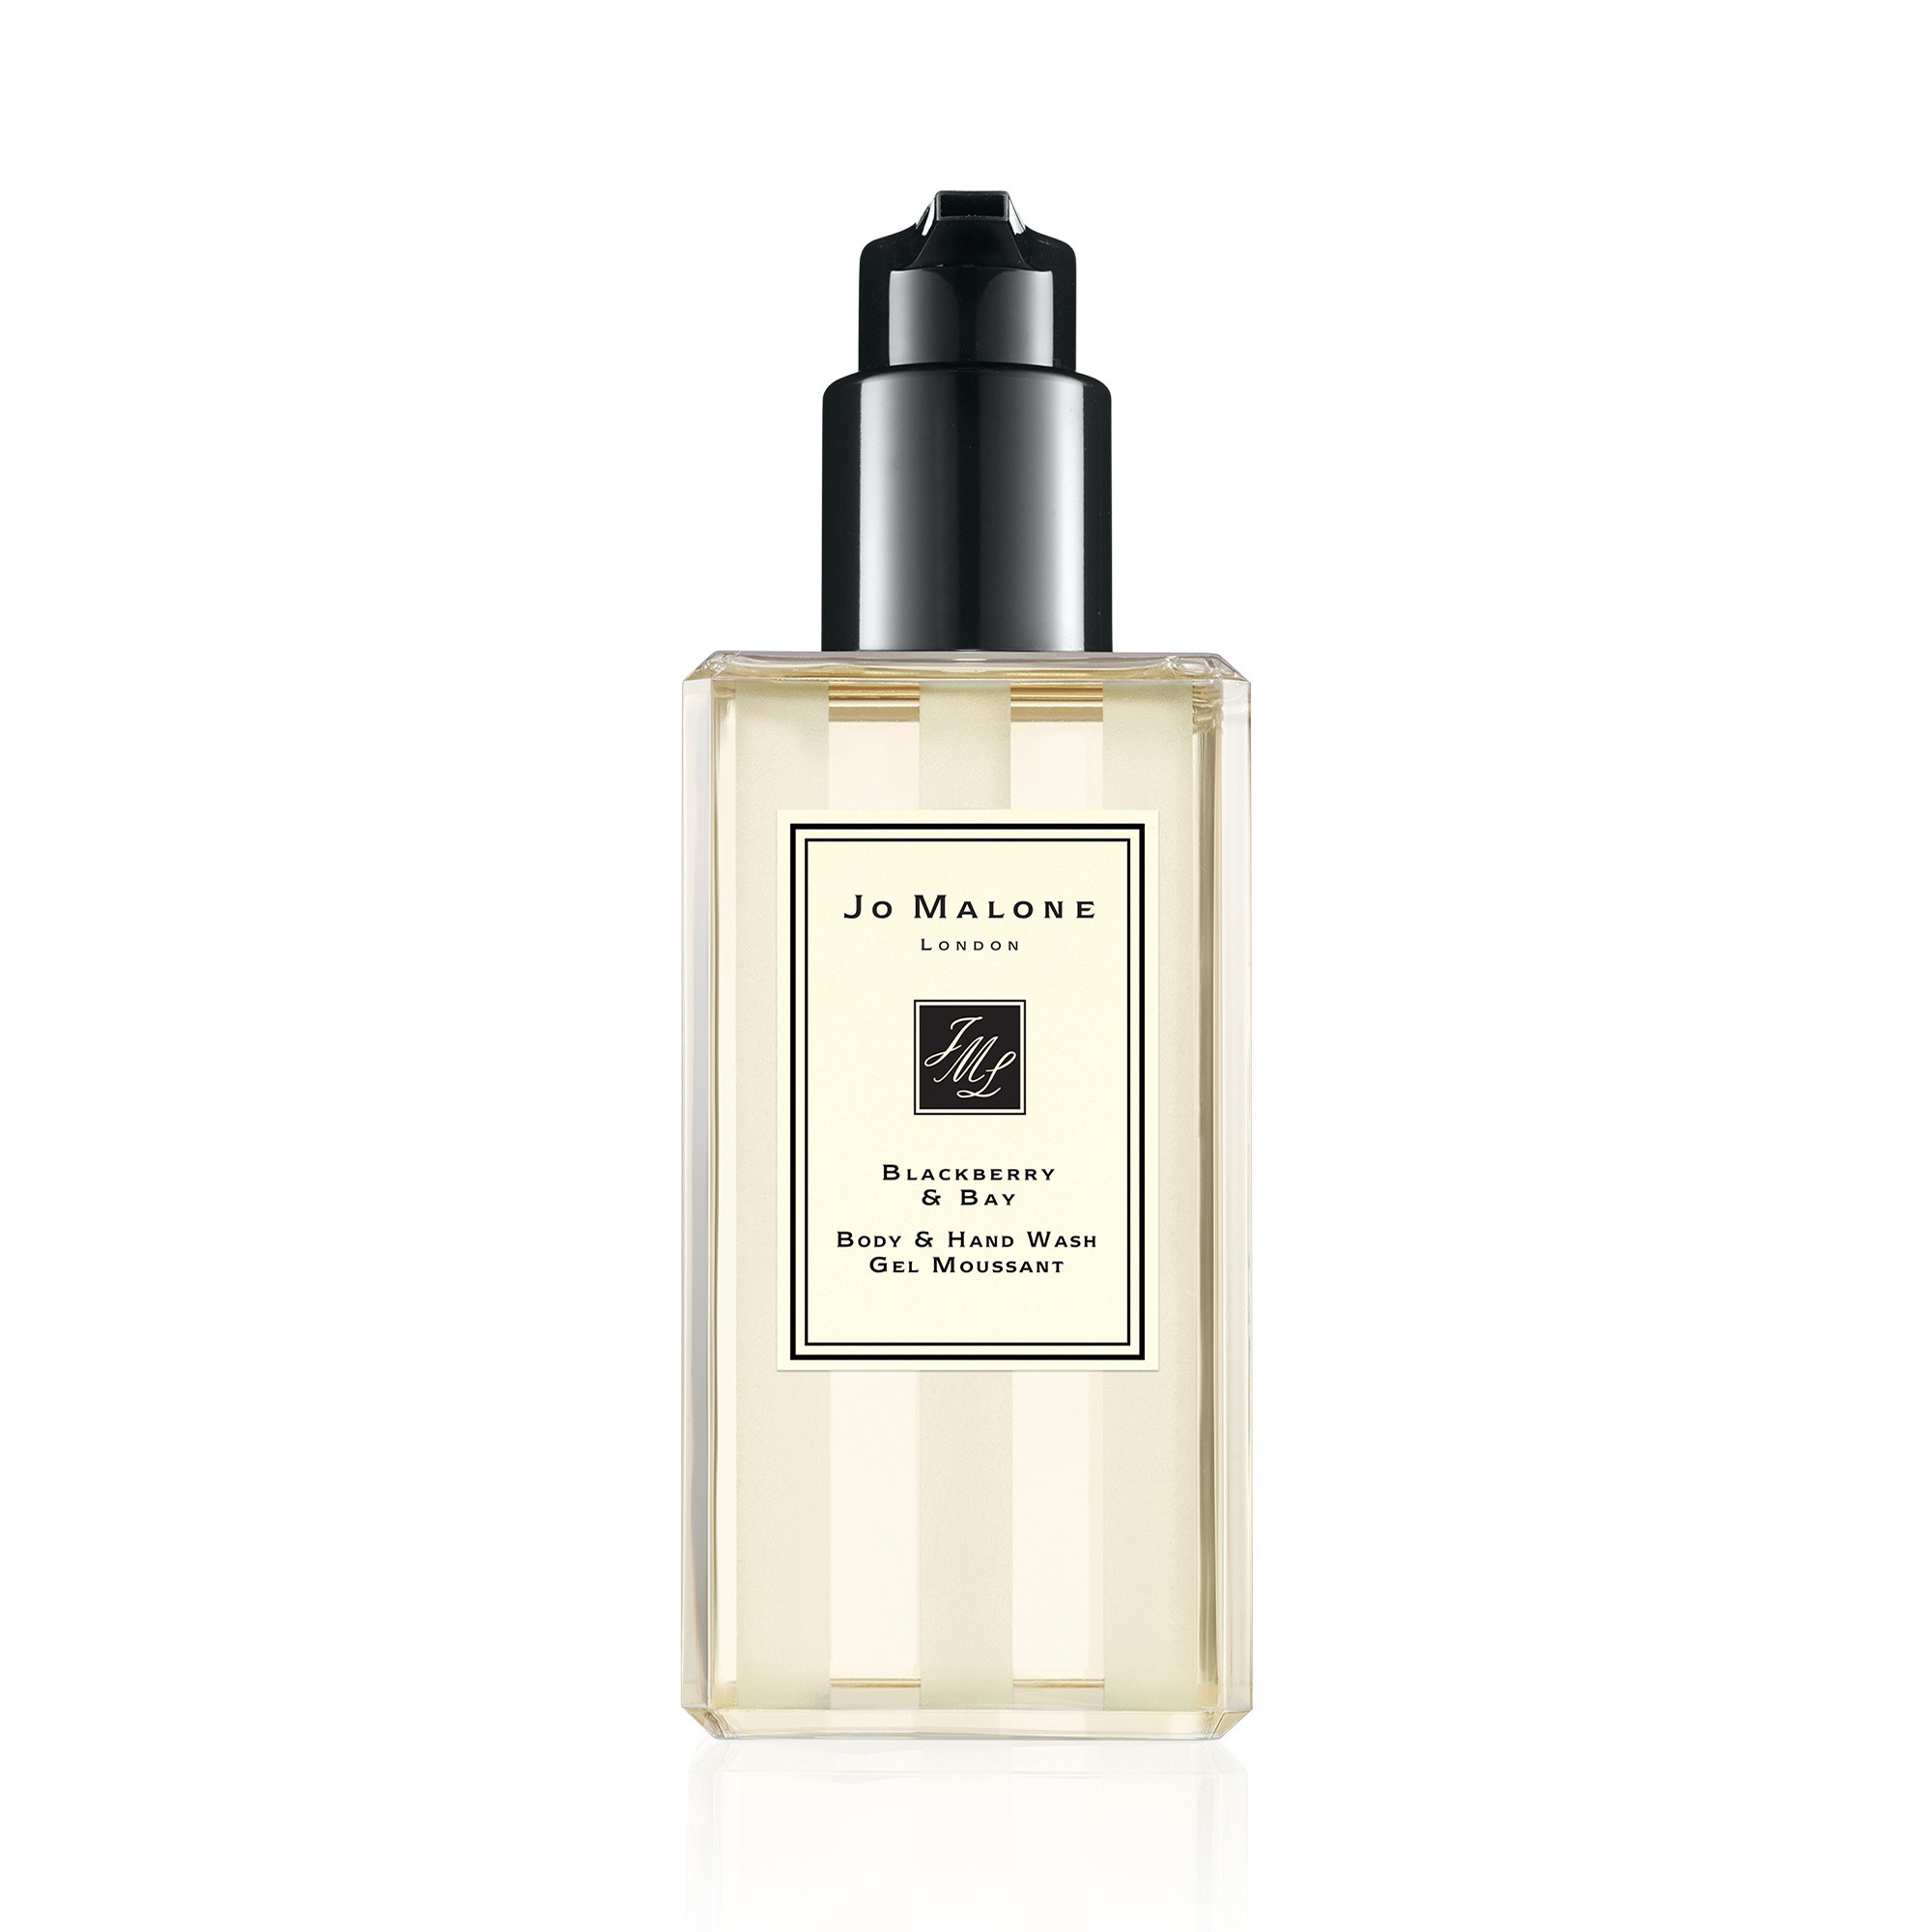 Jo Malone London blackberry & bay body & hand wash 250 ml, Beige, large image number 0